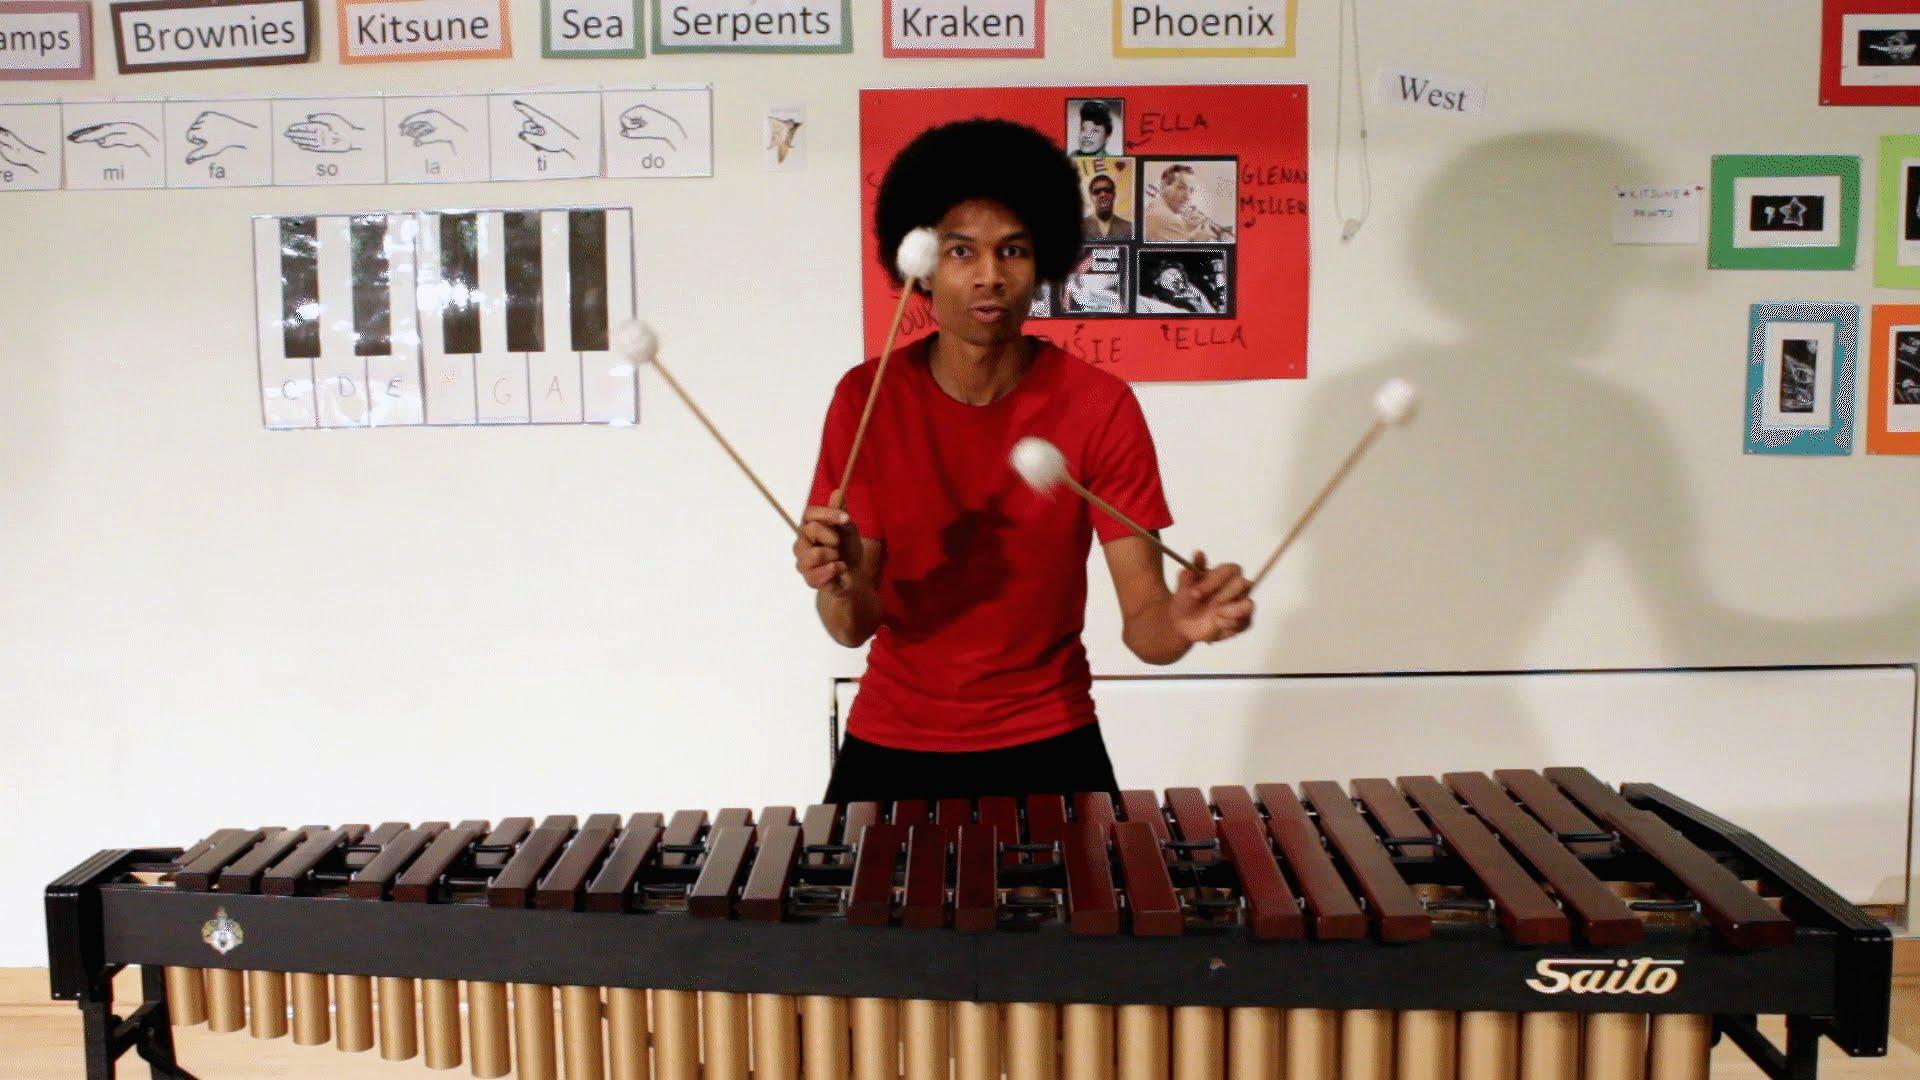 Super Mario Bros. Theme Songs Played on a Marimba